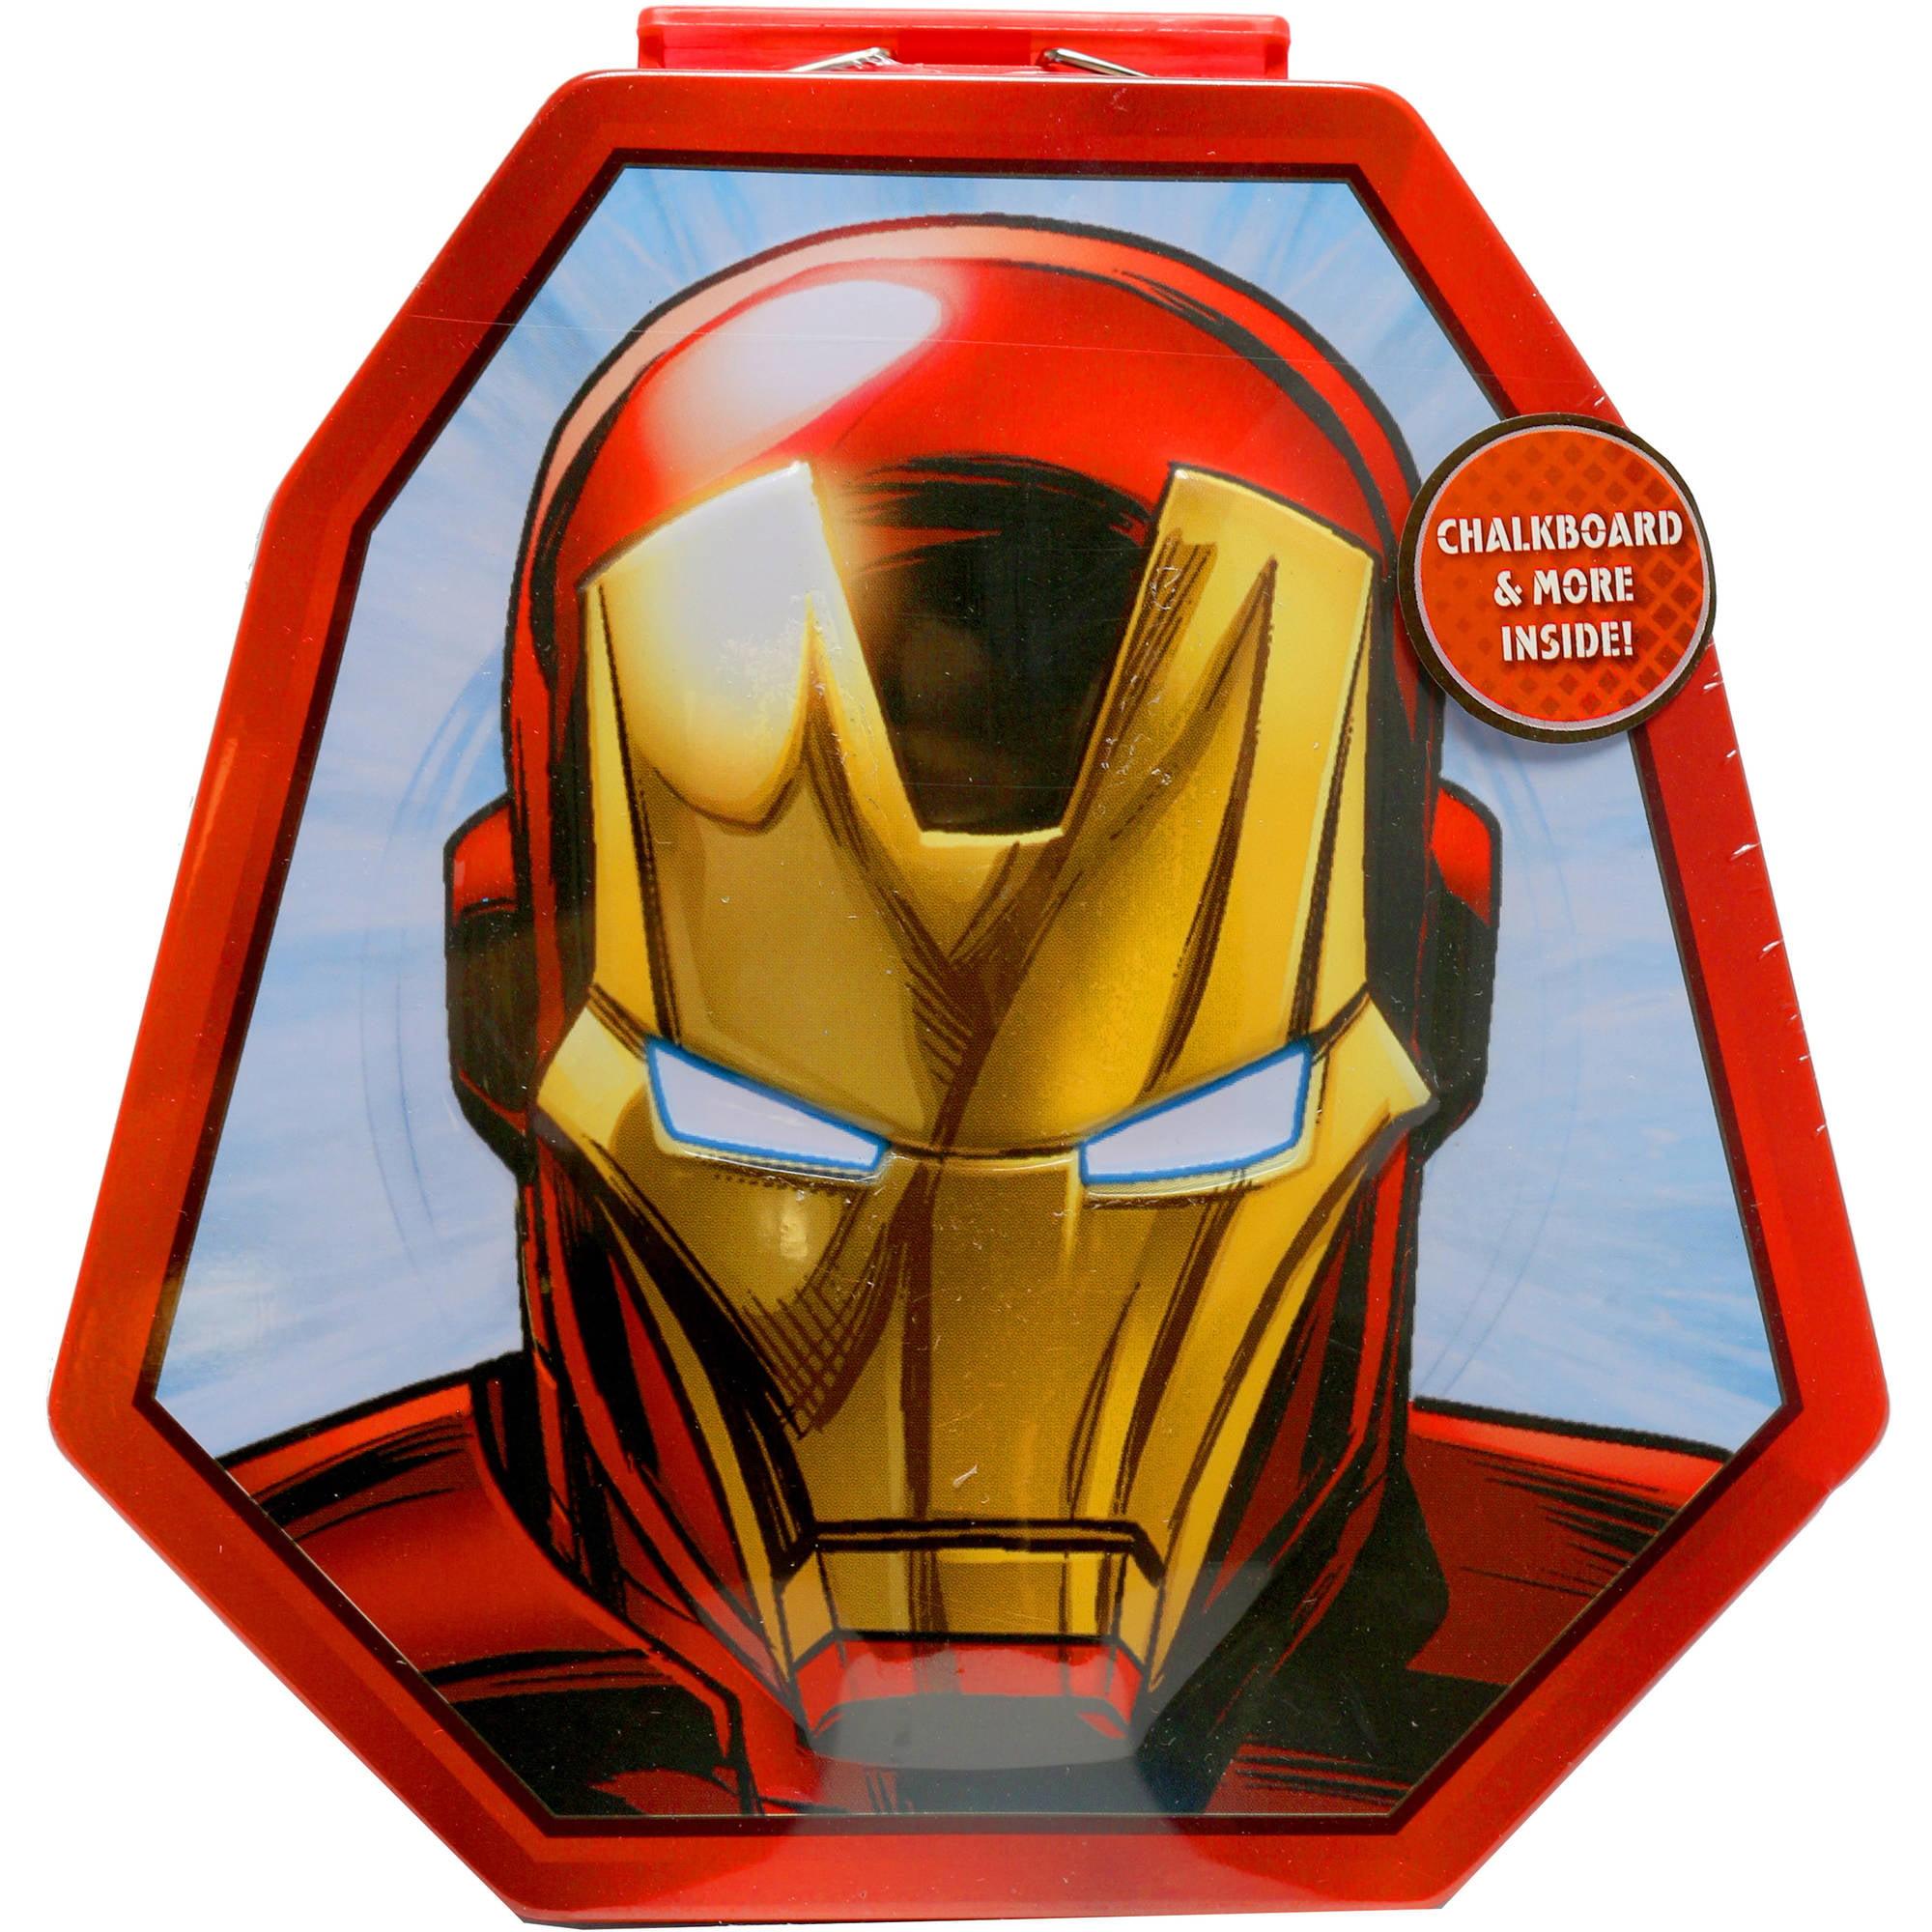 Ironman Chalkboard Activity Case by Tara Toy Corporation